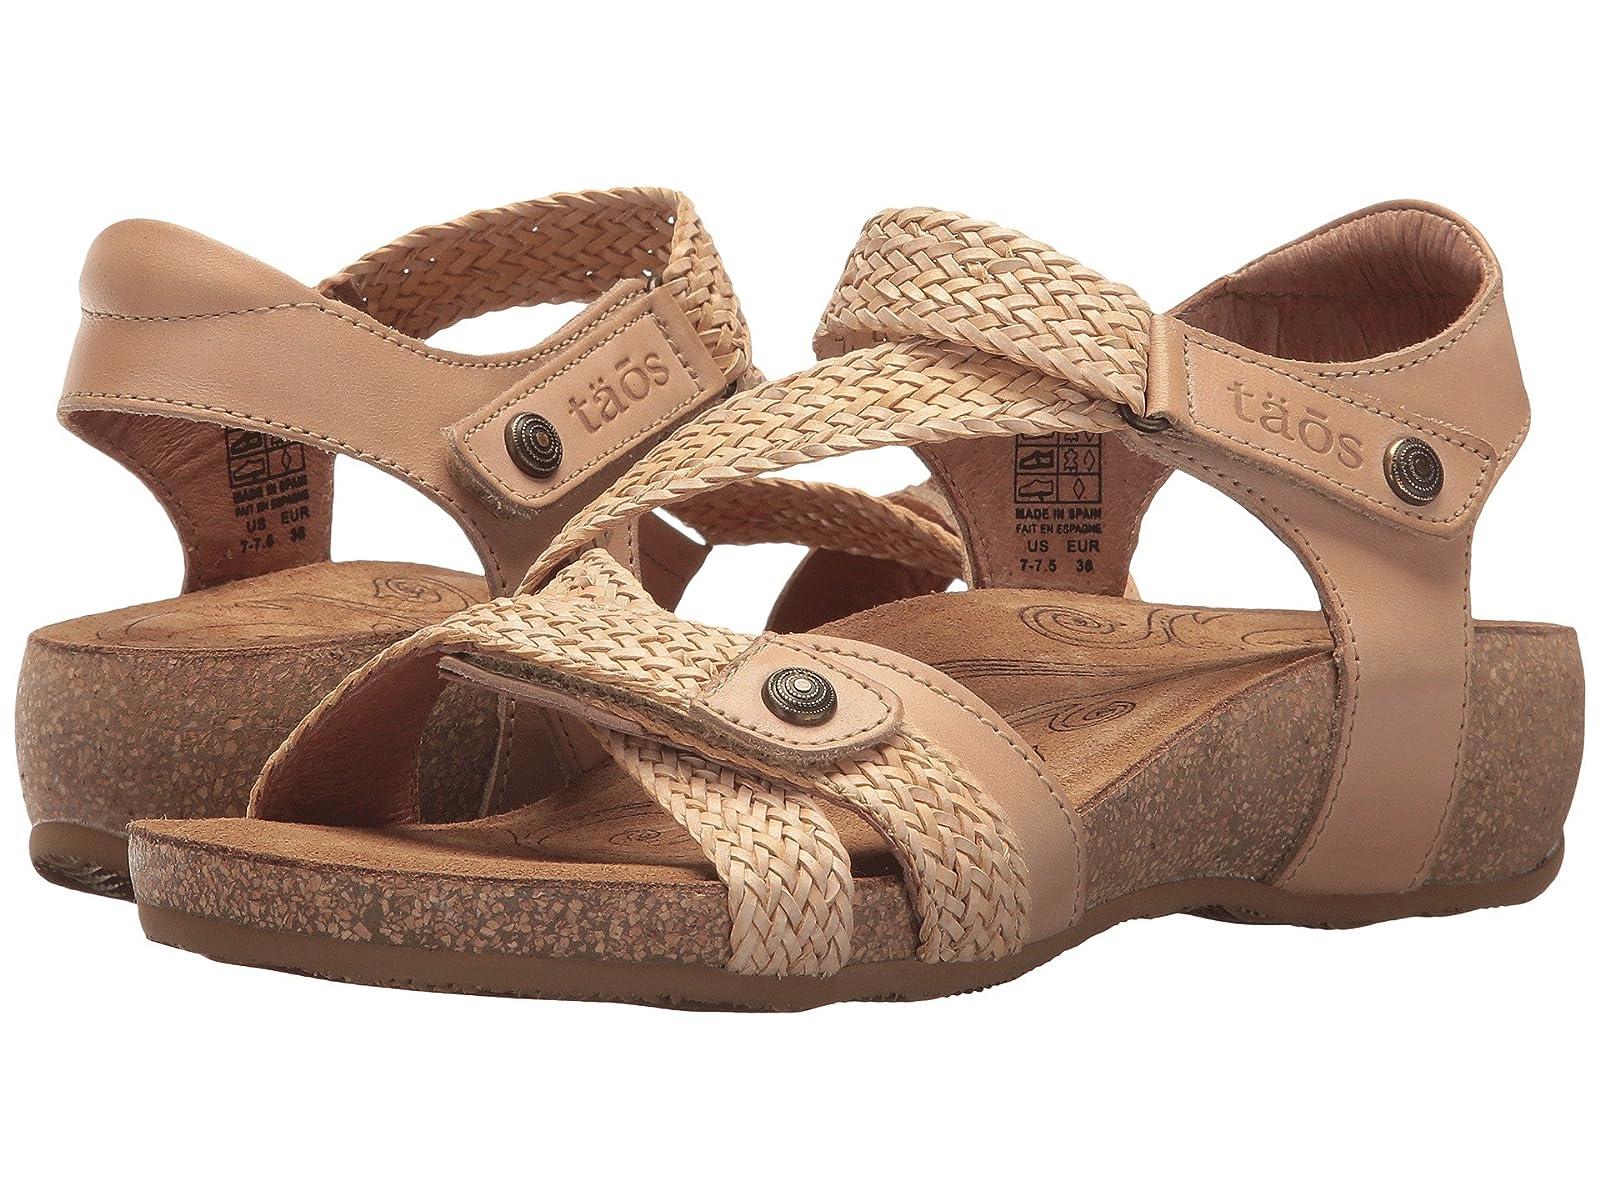 Taos Footwear TrulieAtmospheric grades have affordable shoes